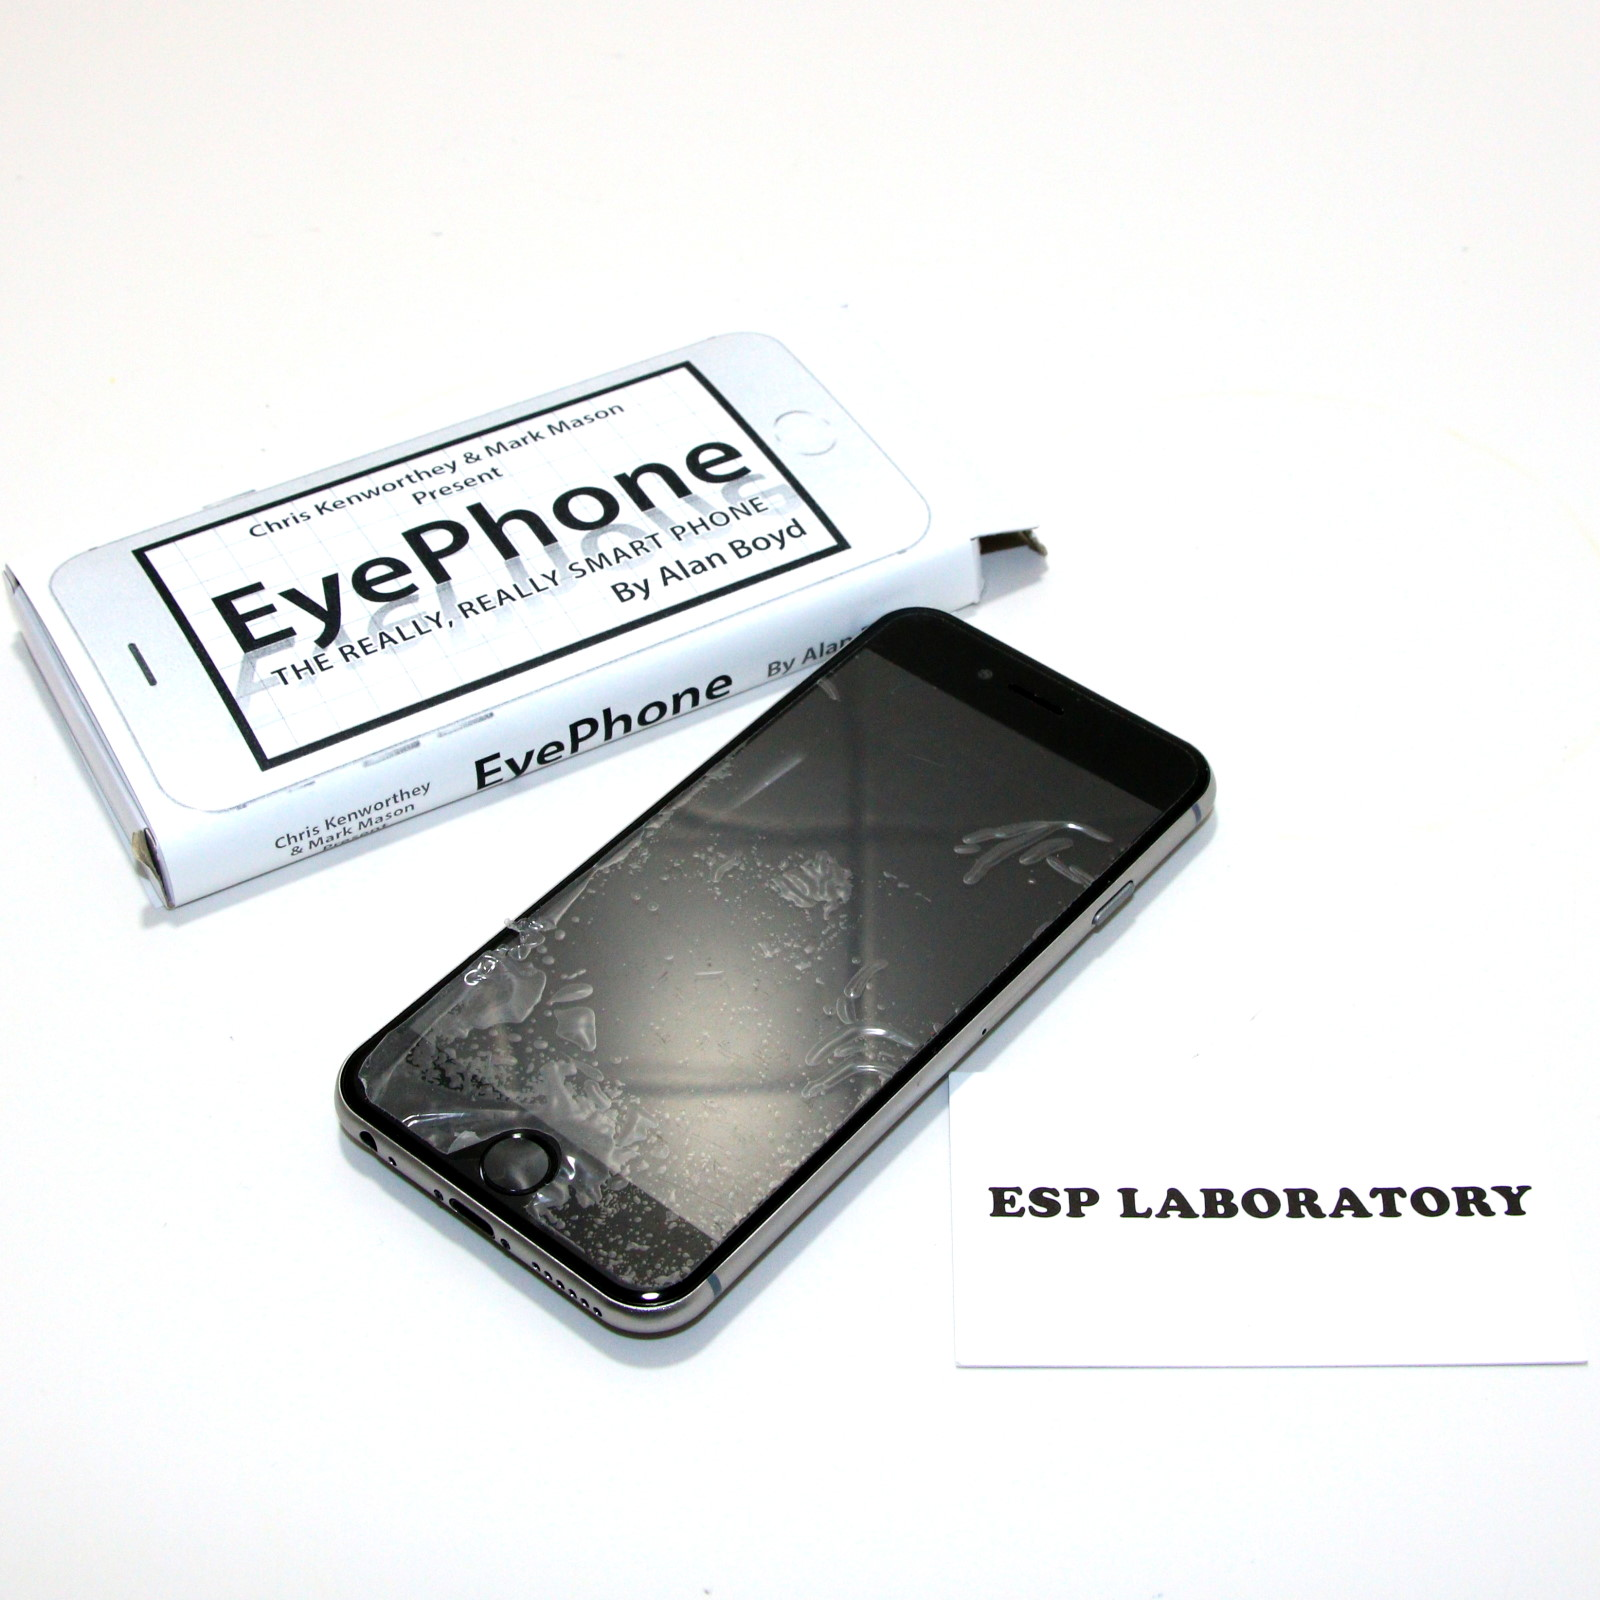 EyePhone by Alan Boyd